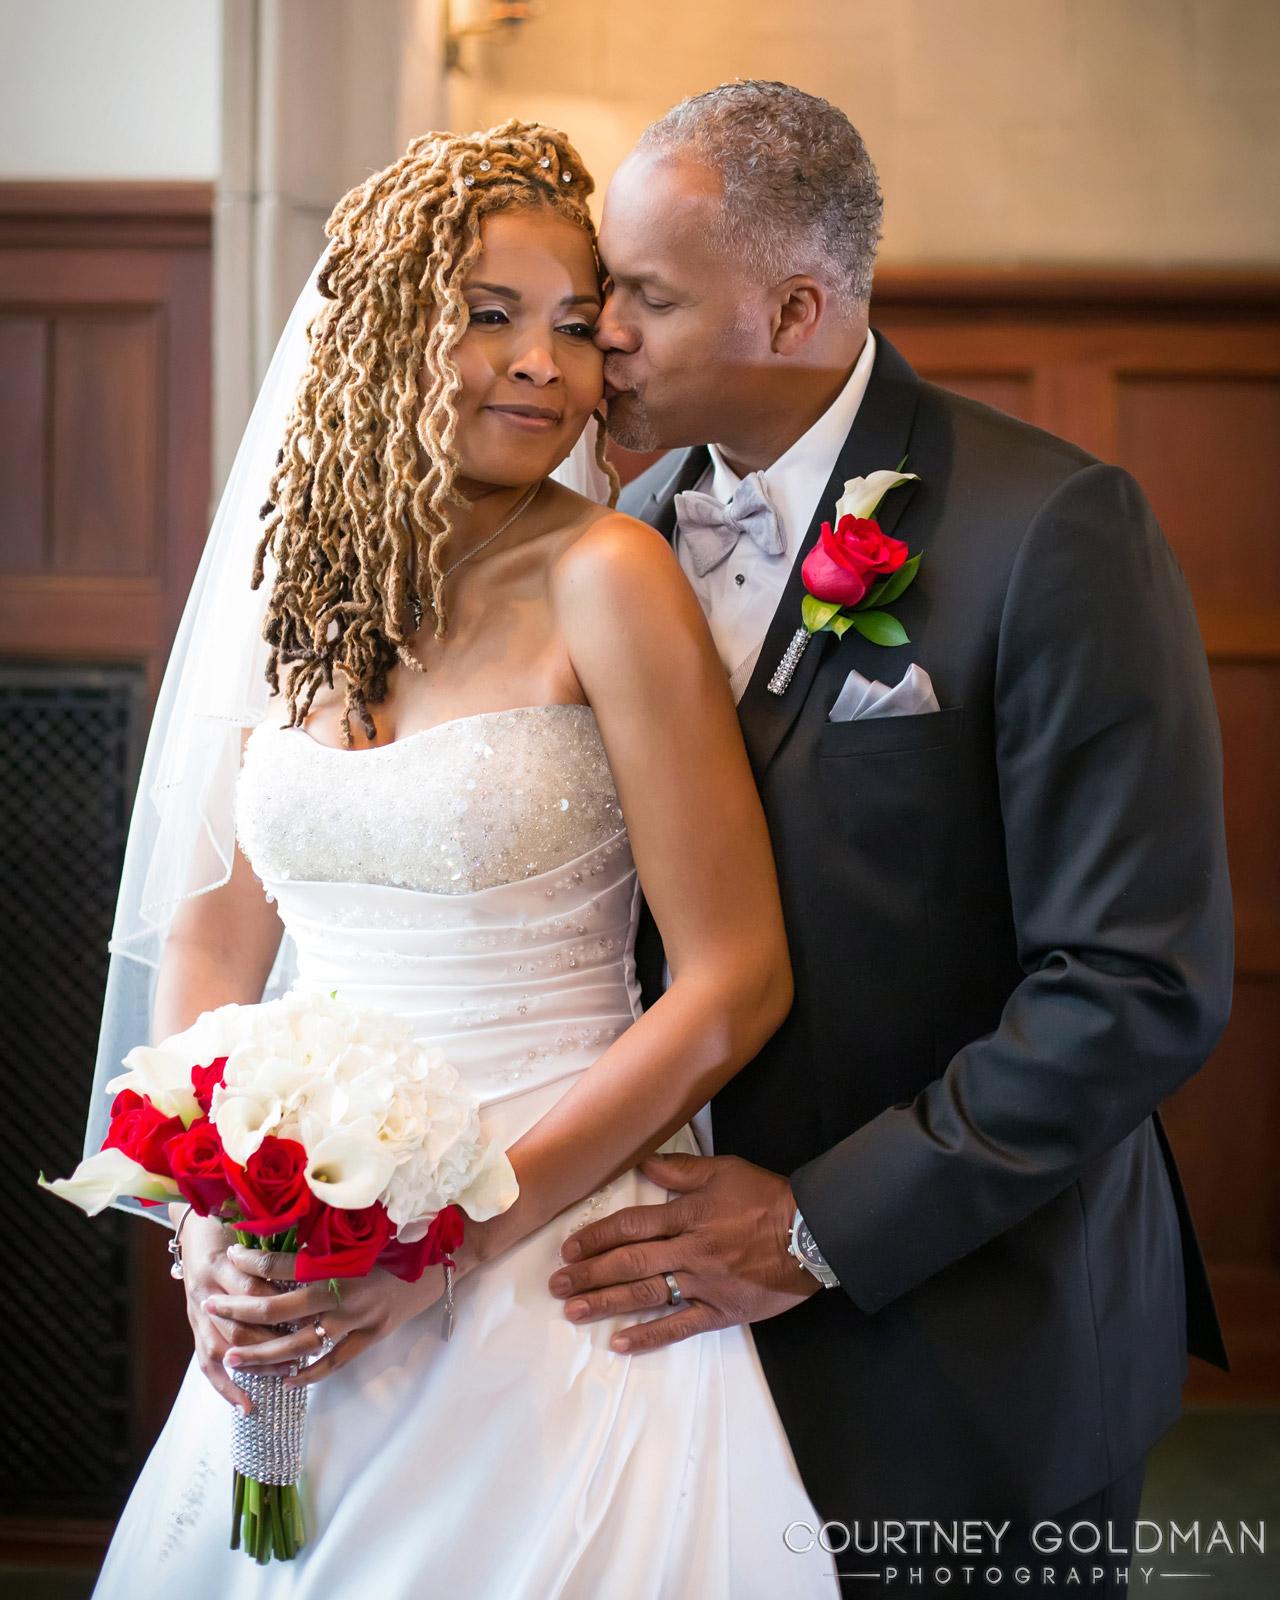 Atlanta-Wedding-Photography-by-Courtney-Goldman-36.jpg